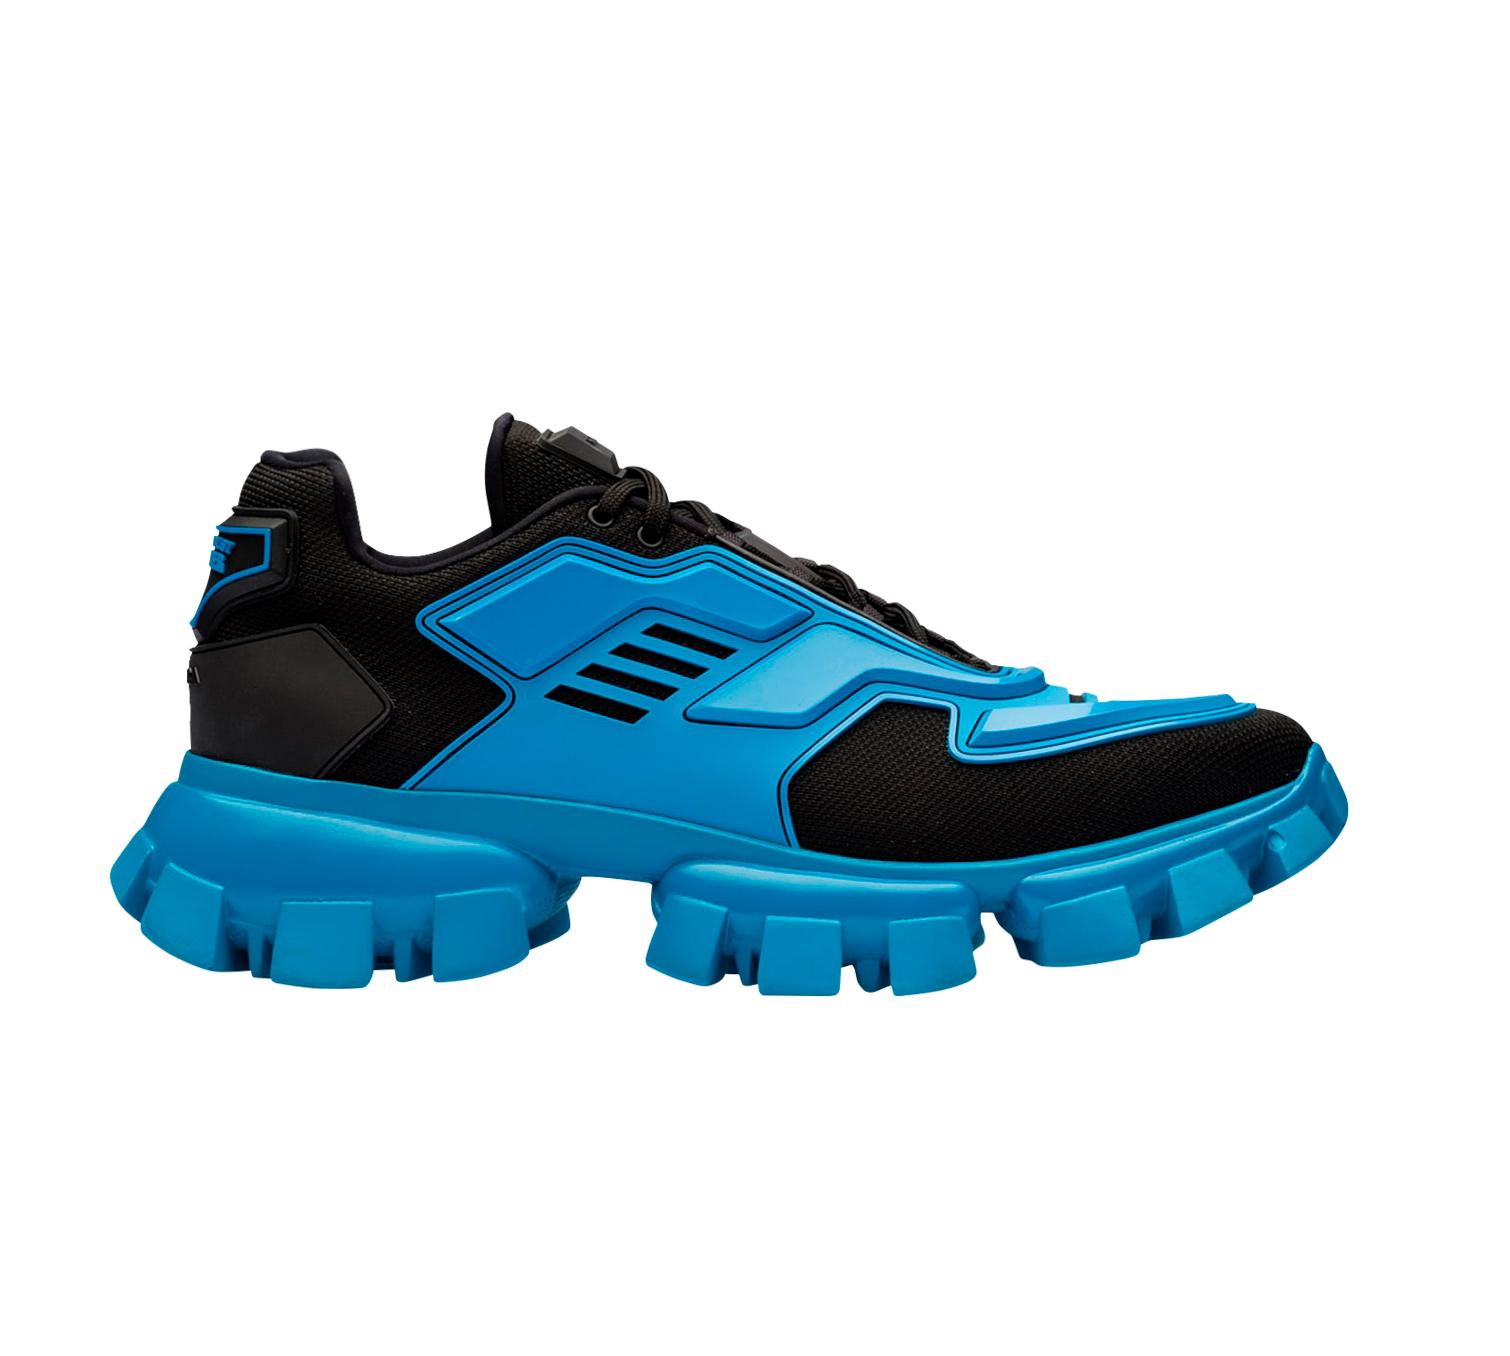 sneakers04_revistamine_interior